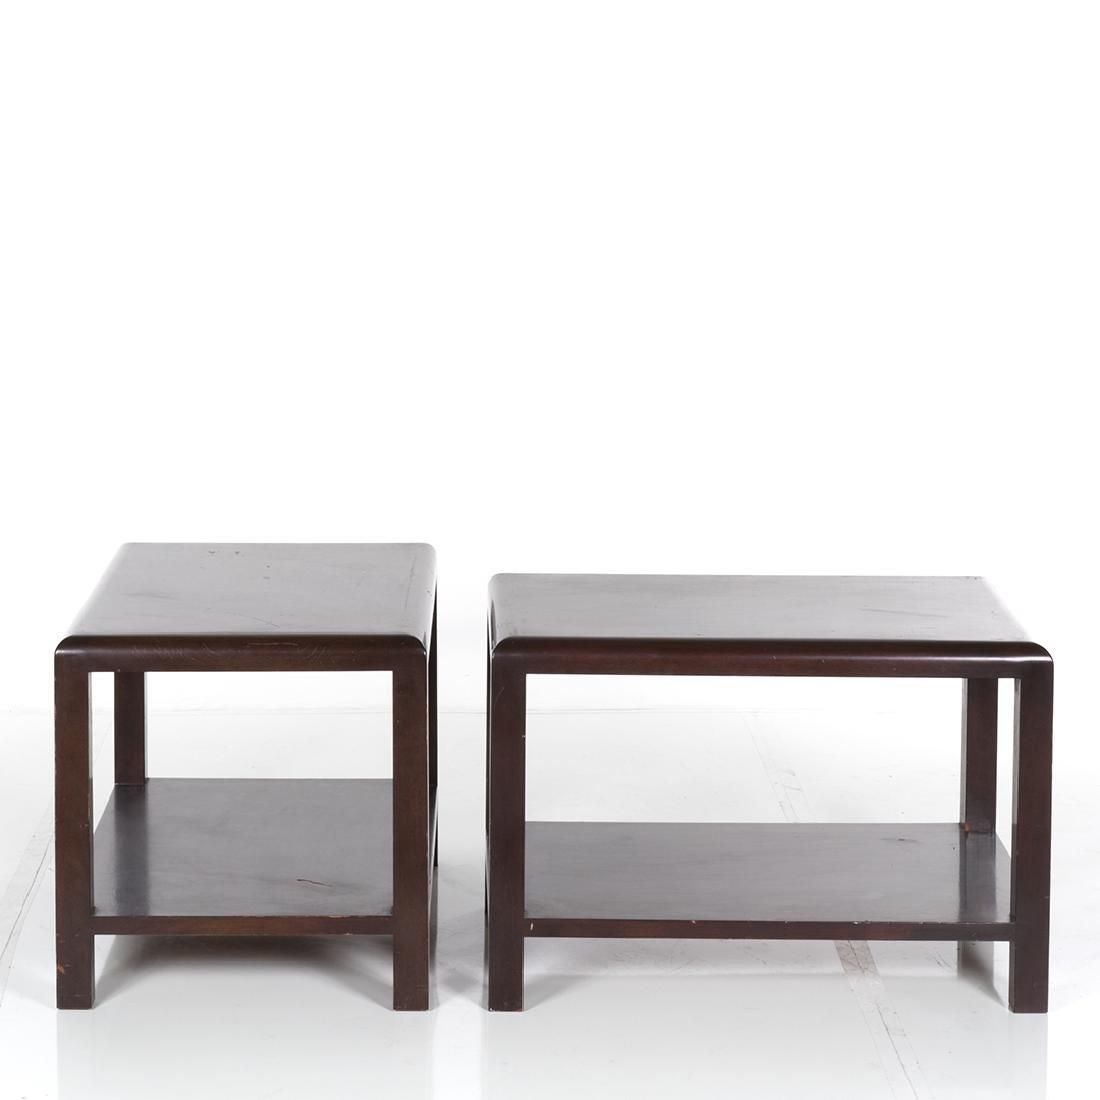 Samuel Marx Side Tables (2) - 2